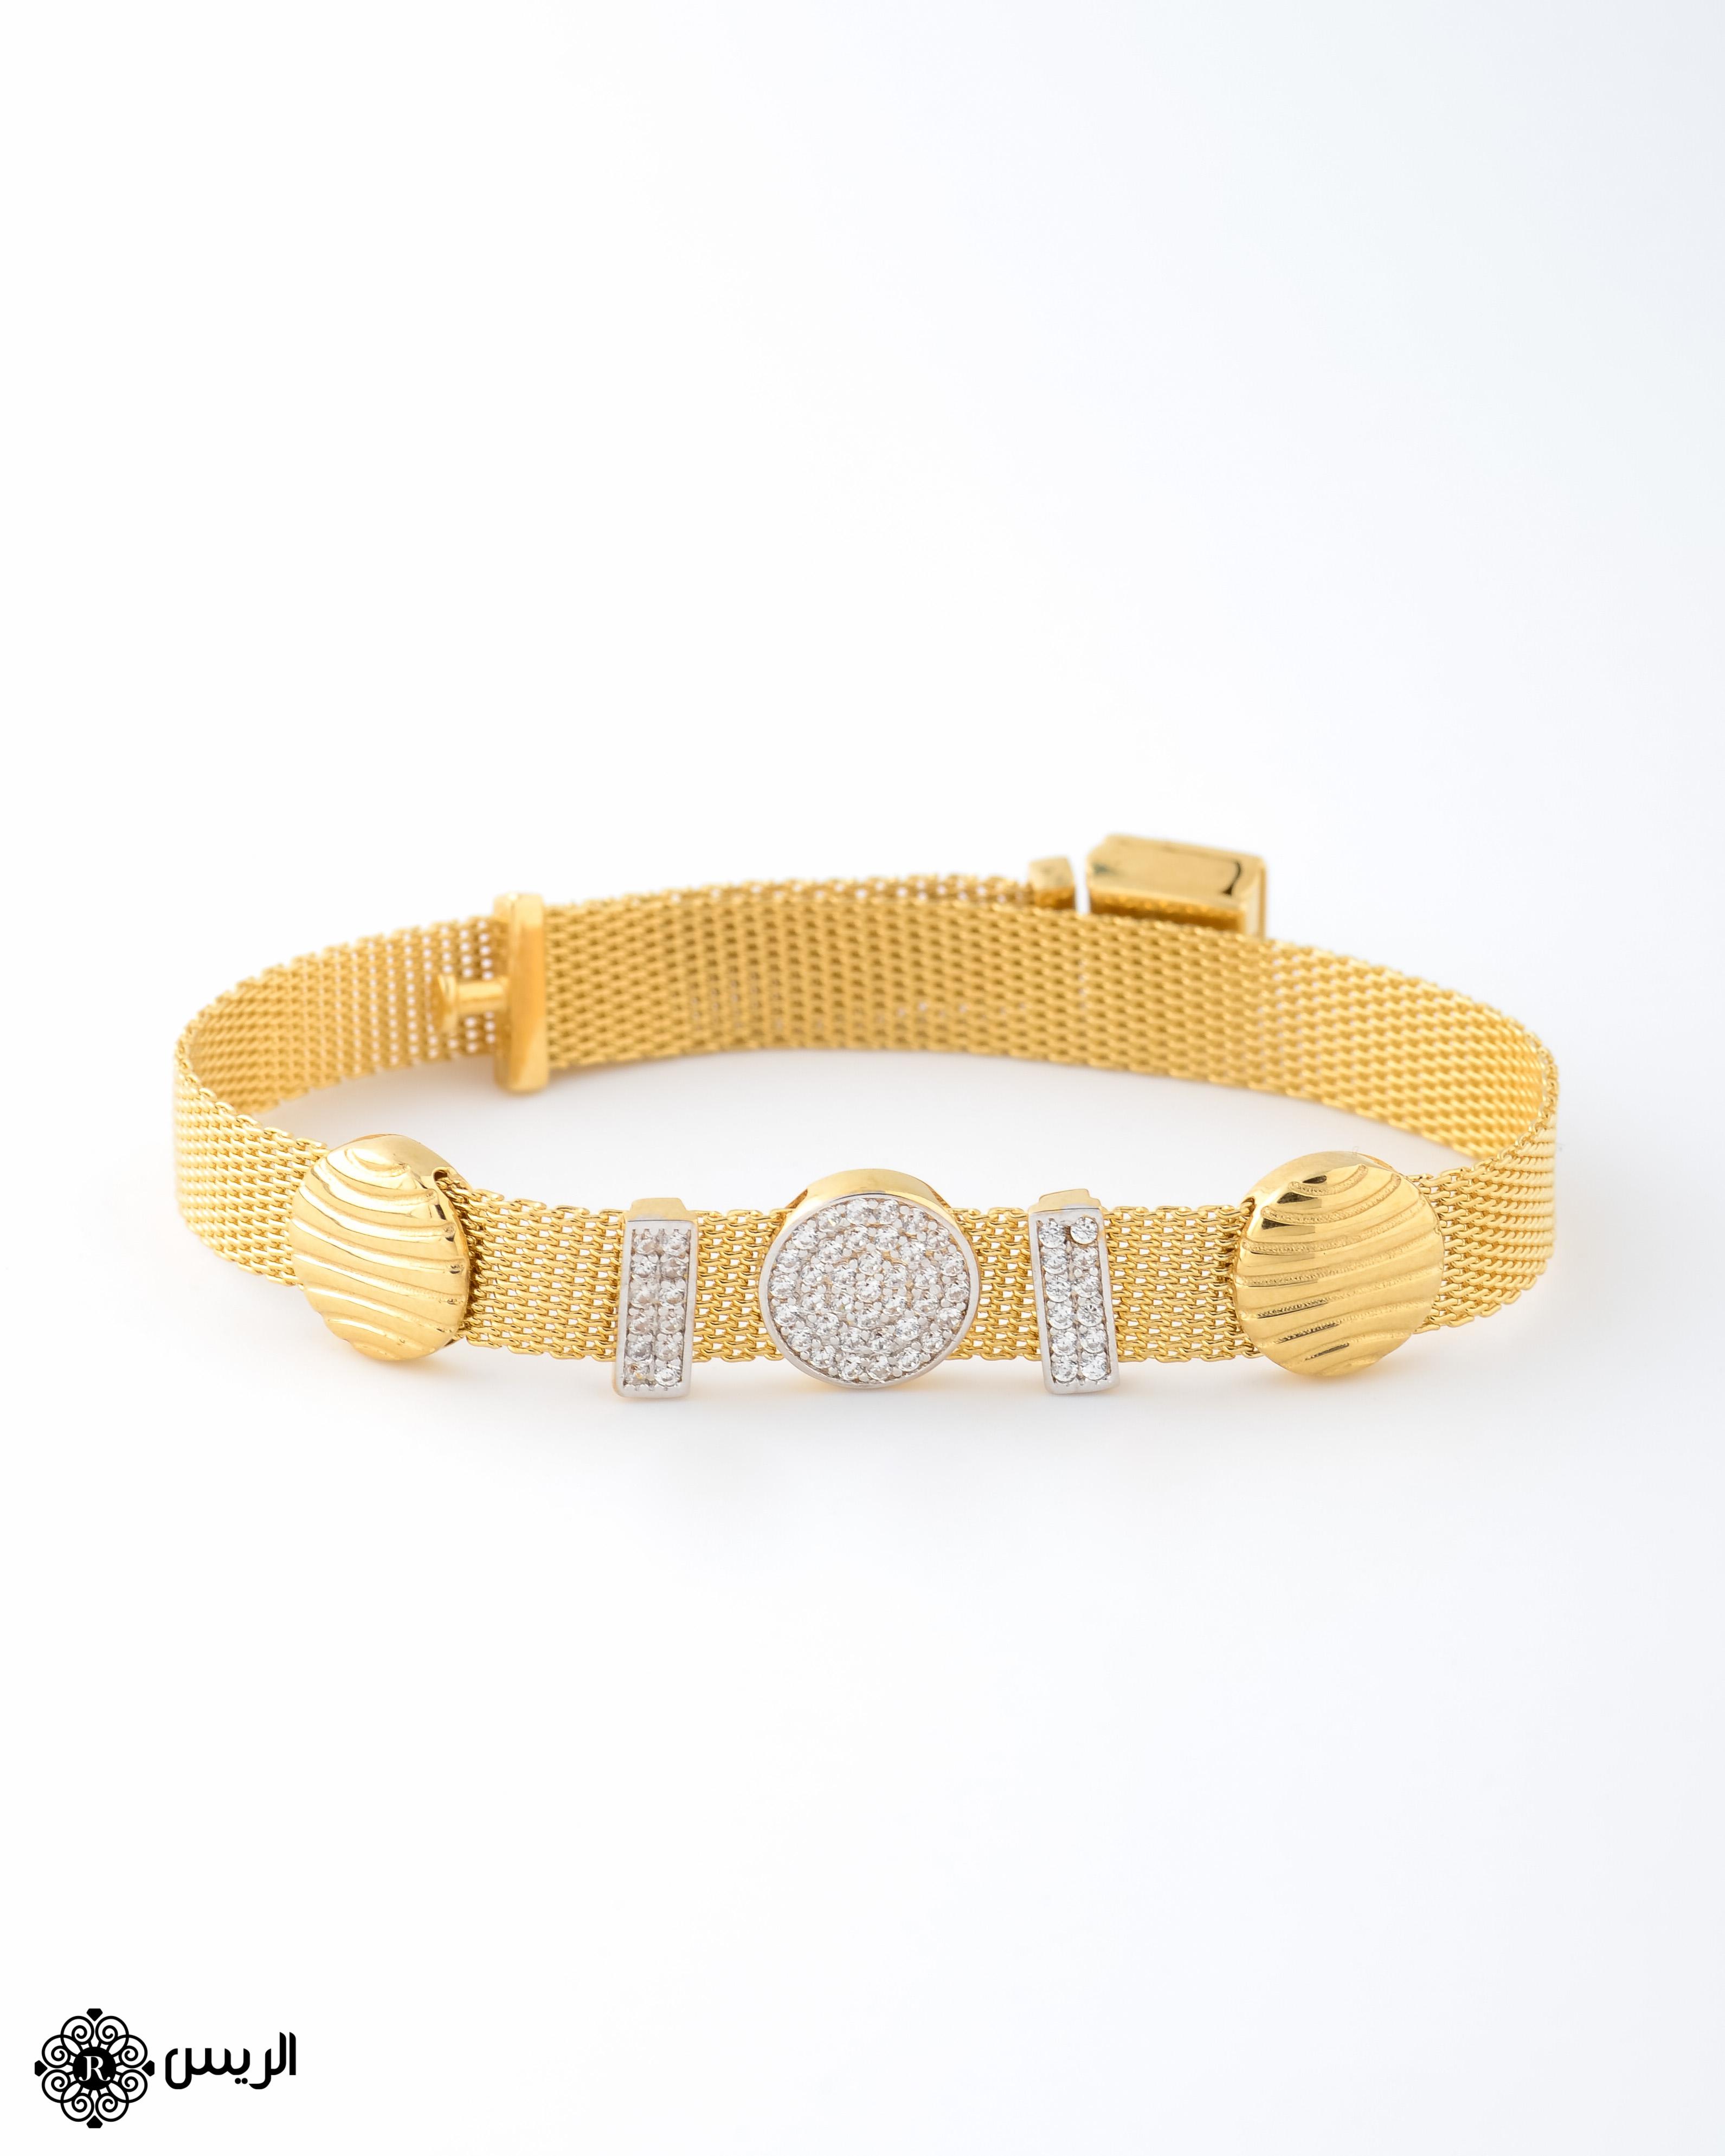 Raies jewelry Bracelet Spore Design إسورة (إنسيالة) تصميم سبور الريس للمجوهرات